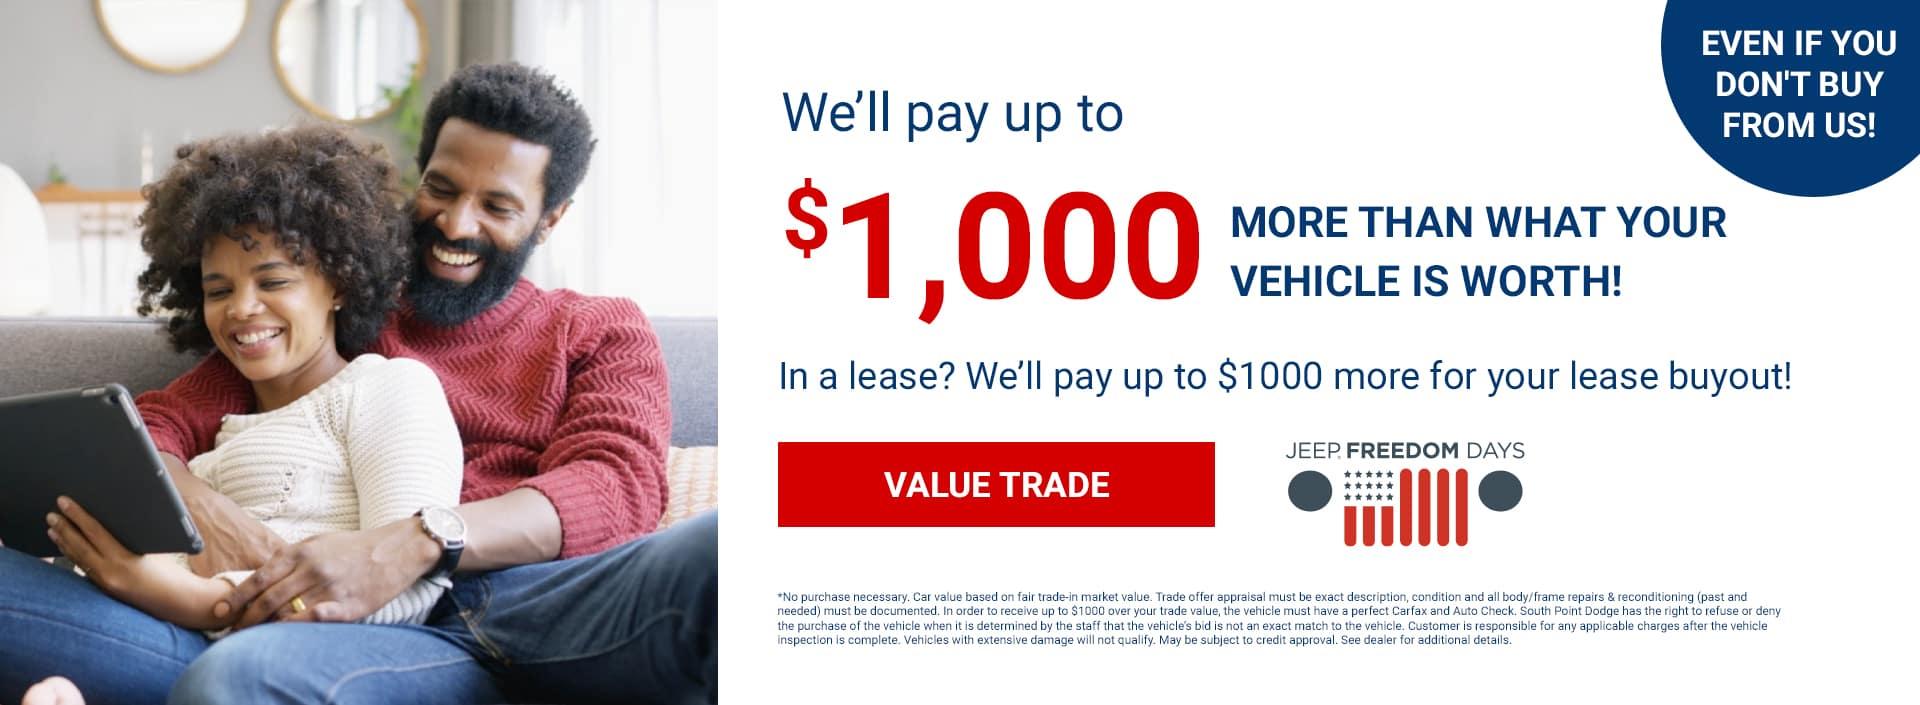 SPCDJR_We'll Pay $1000 More